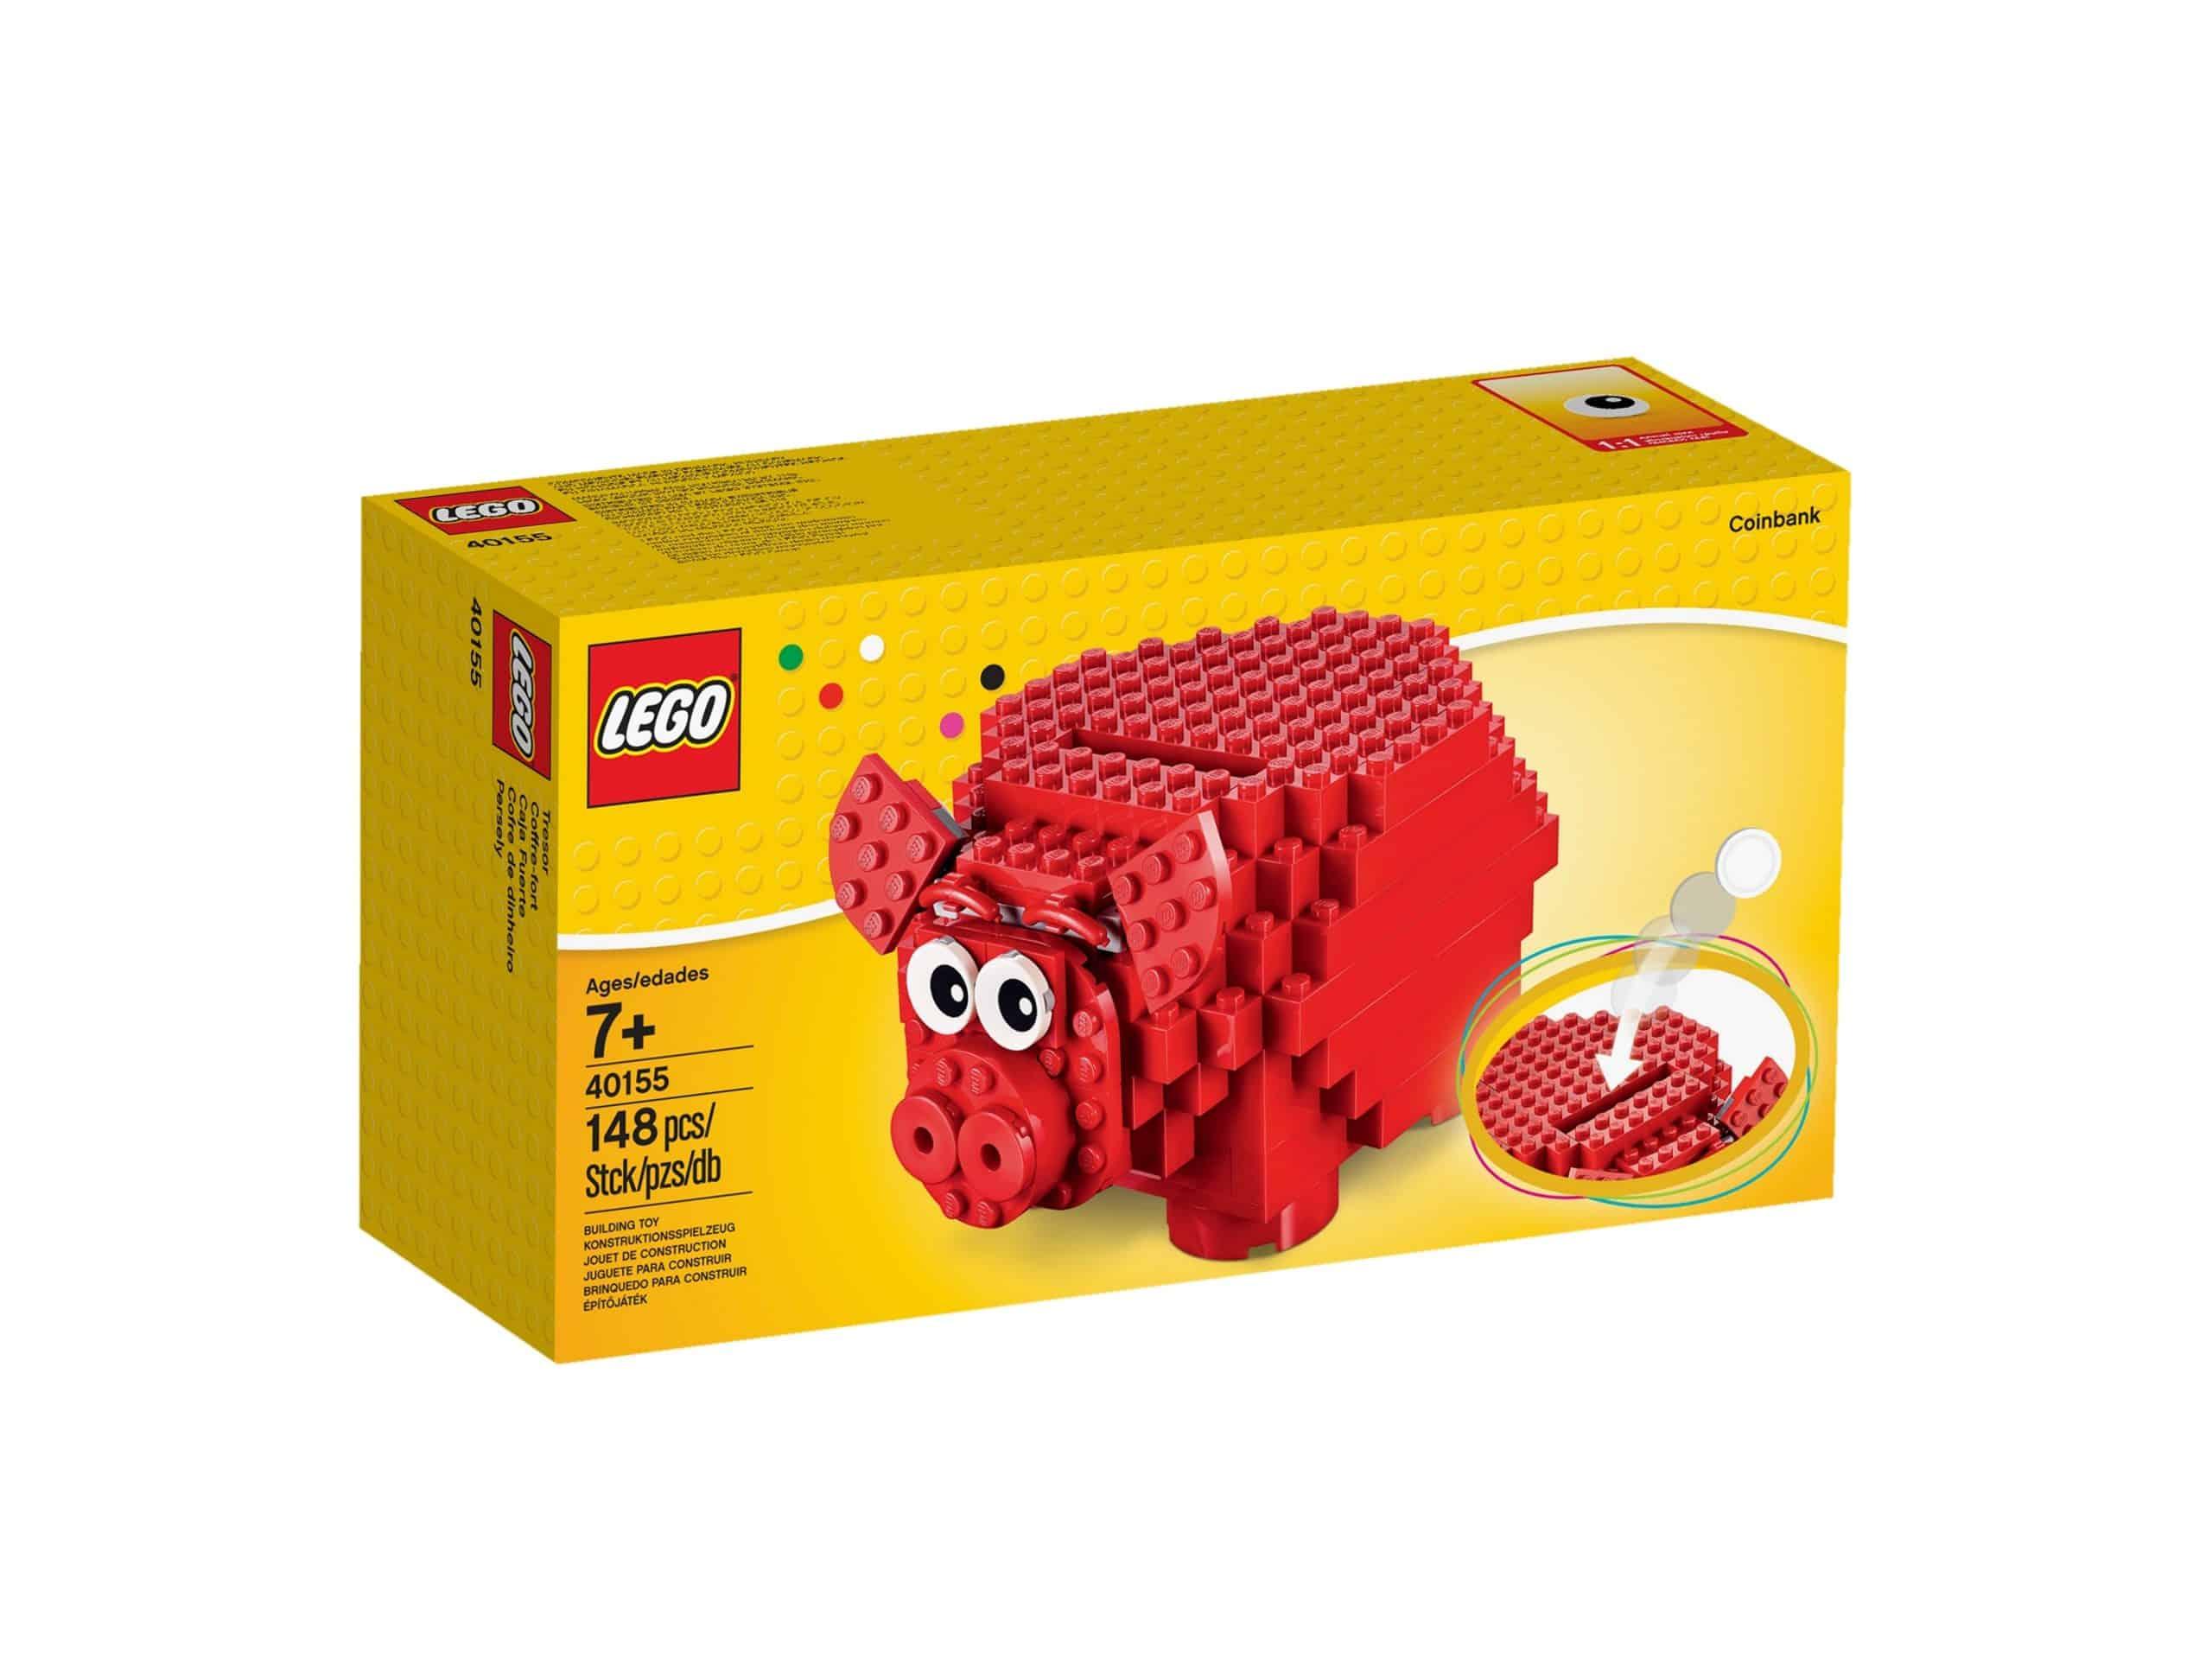 lego 40155 sparschwein scaled